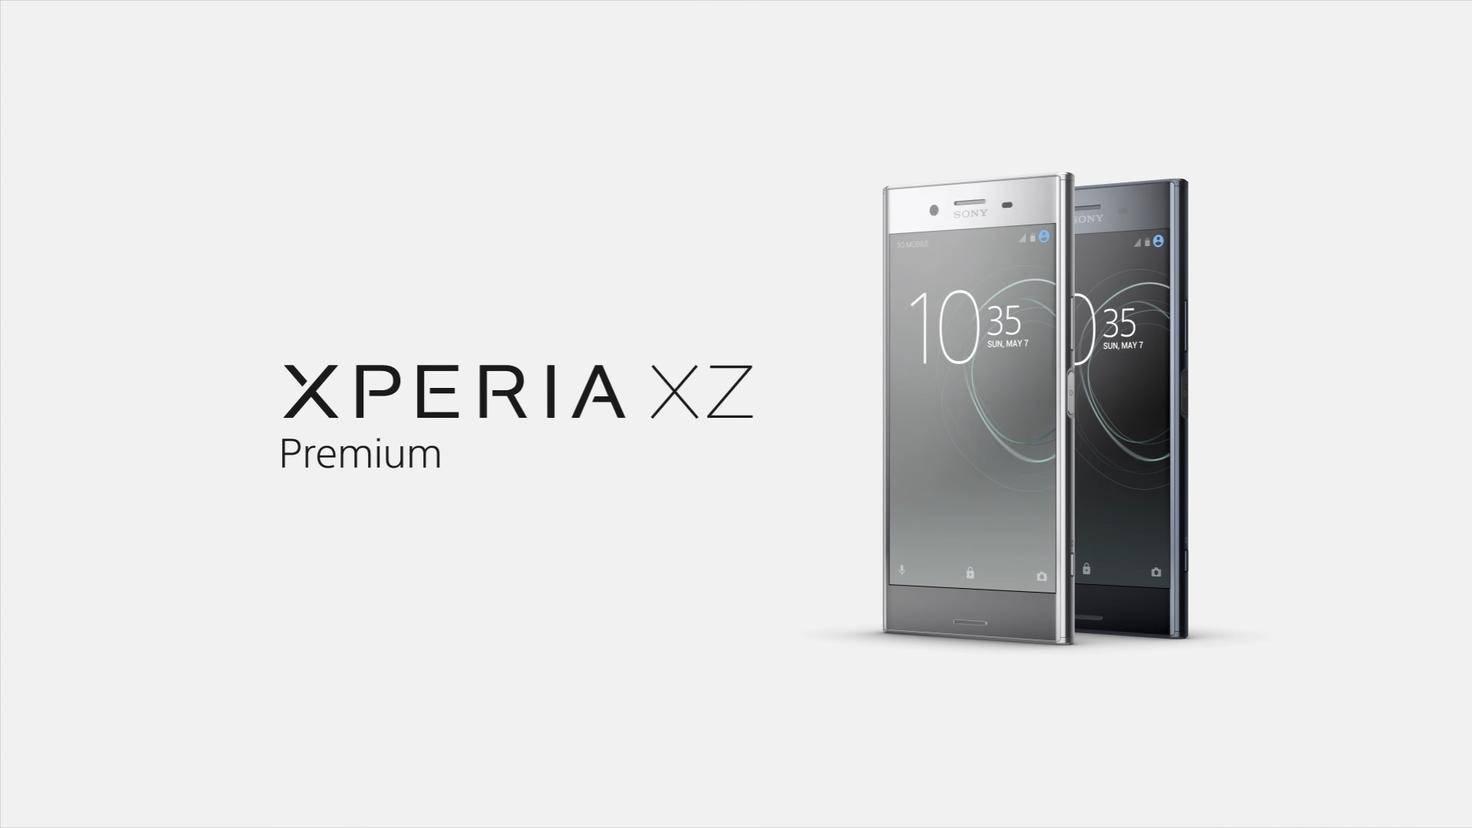 Xperia XZ Premium 2